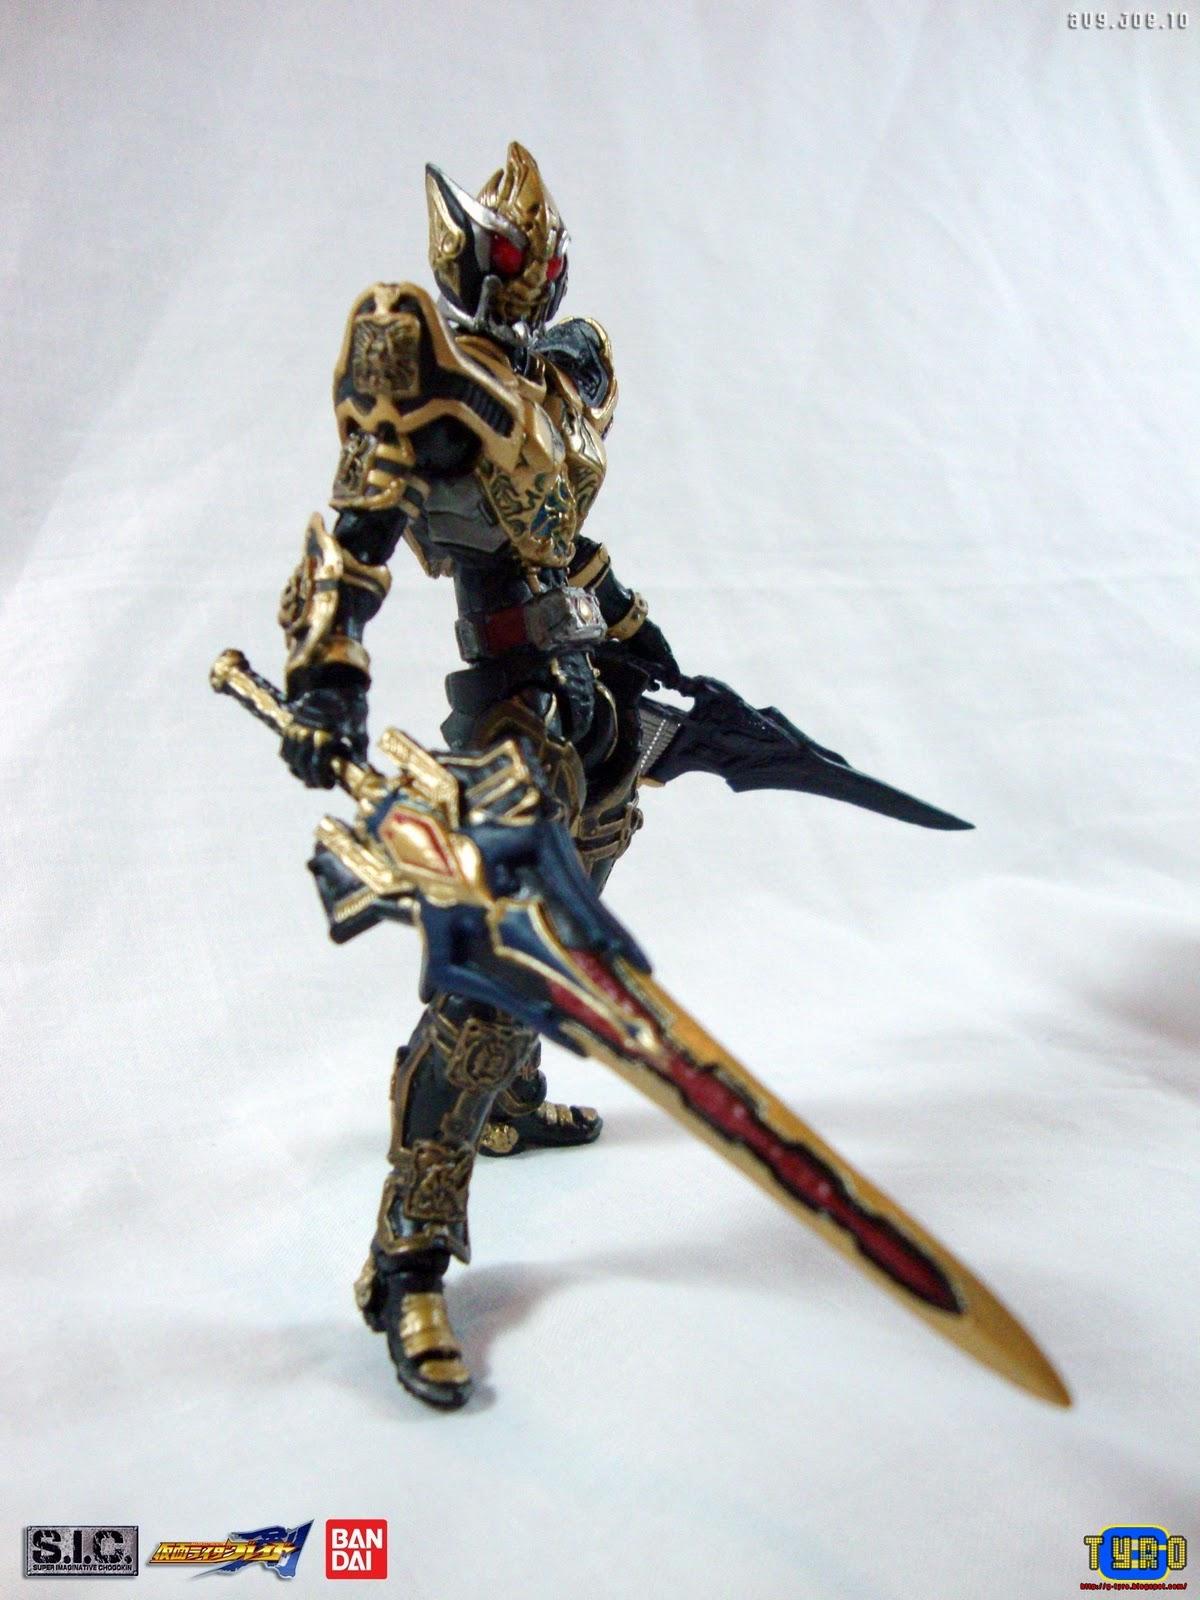 Gunpla-Tyro: [GALLERY] Kiwami Vol.14 Kamen Rider Blade ...